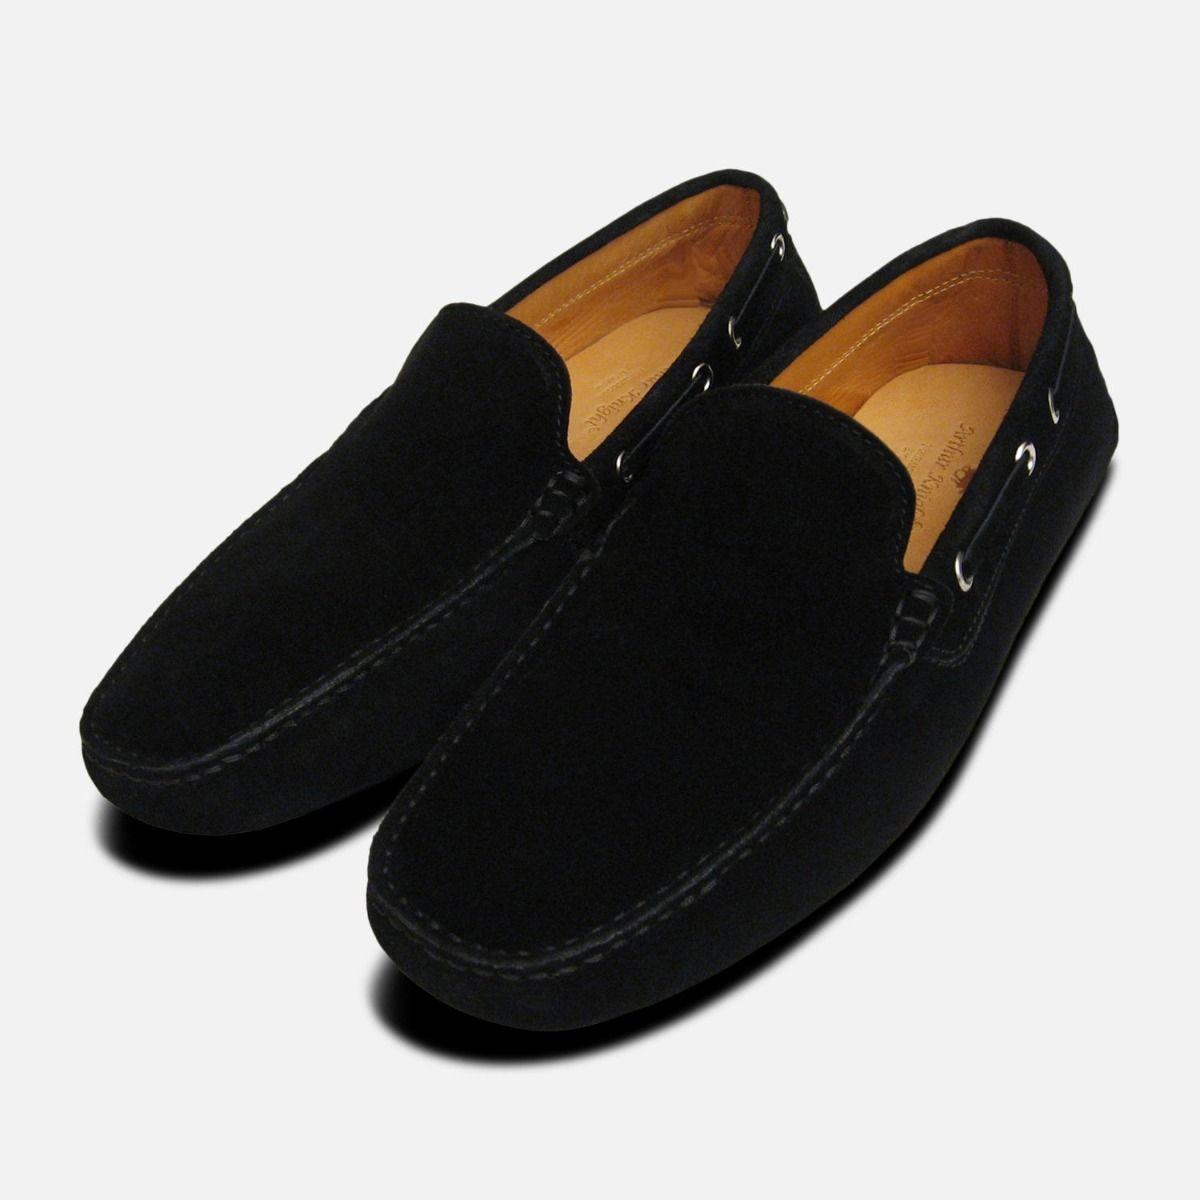 2cfc3c820ac44b Mens Black Suede Italian Driving Shoe Moccasins